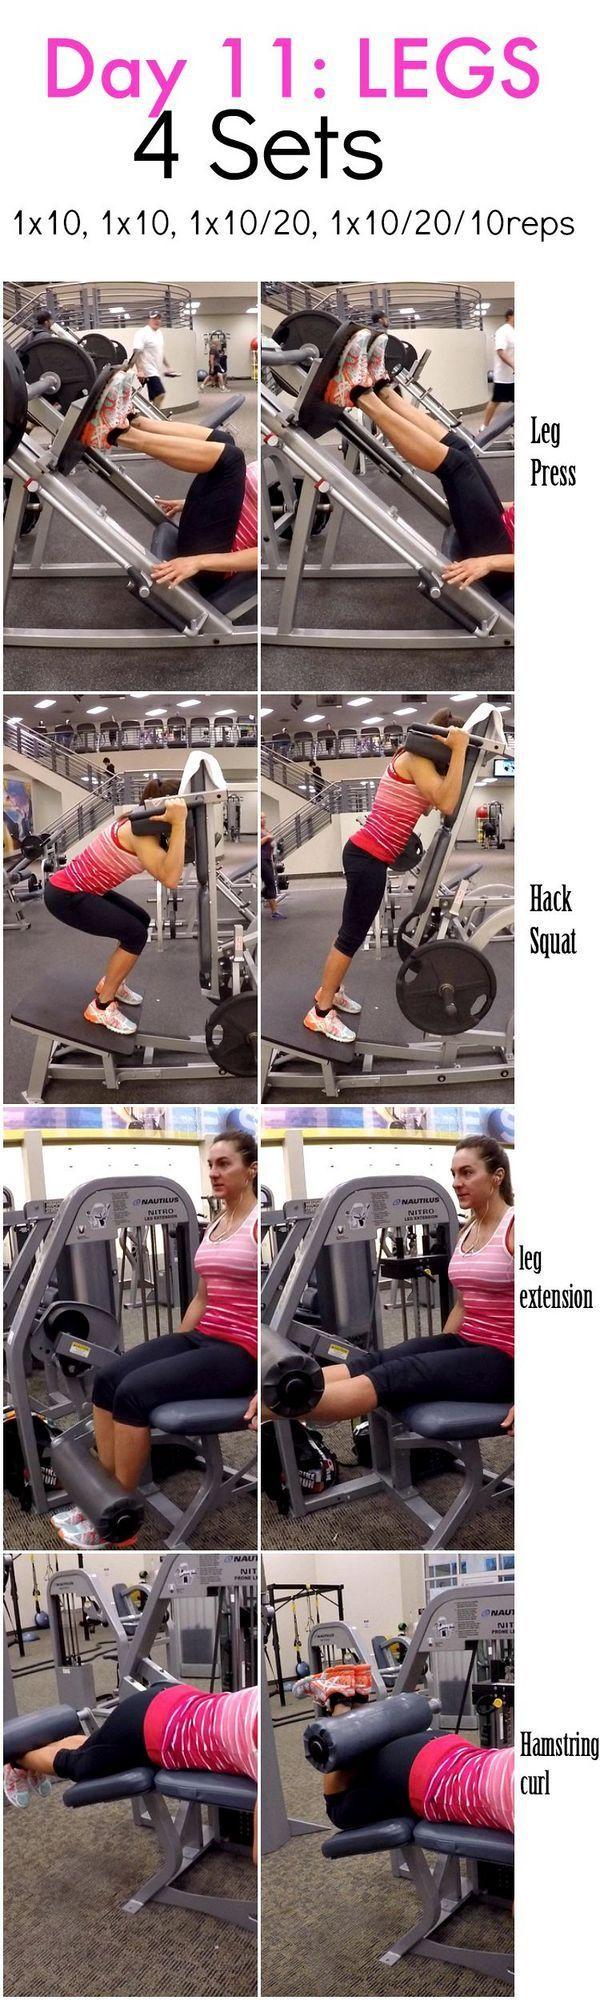 #bloglovin #fitness #shred #days #legs #food #diva #day28 Days 2 Shred: Day 11-LEGS (Fitness Food Di...